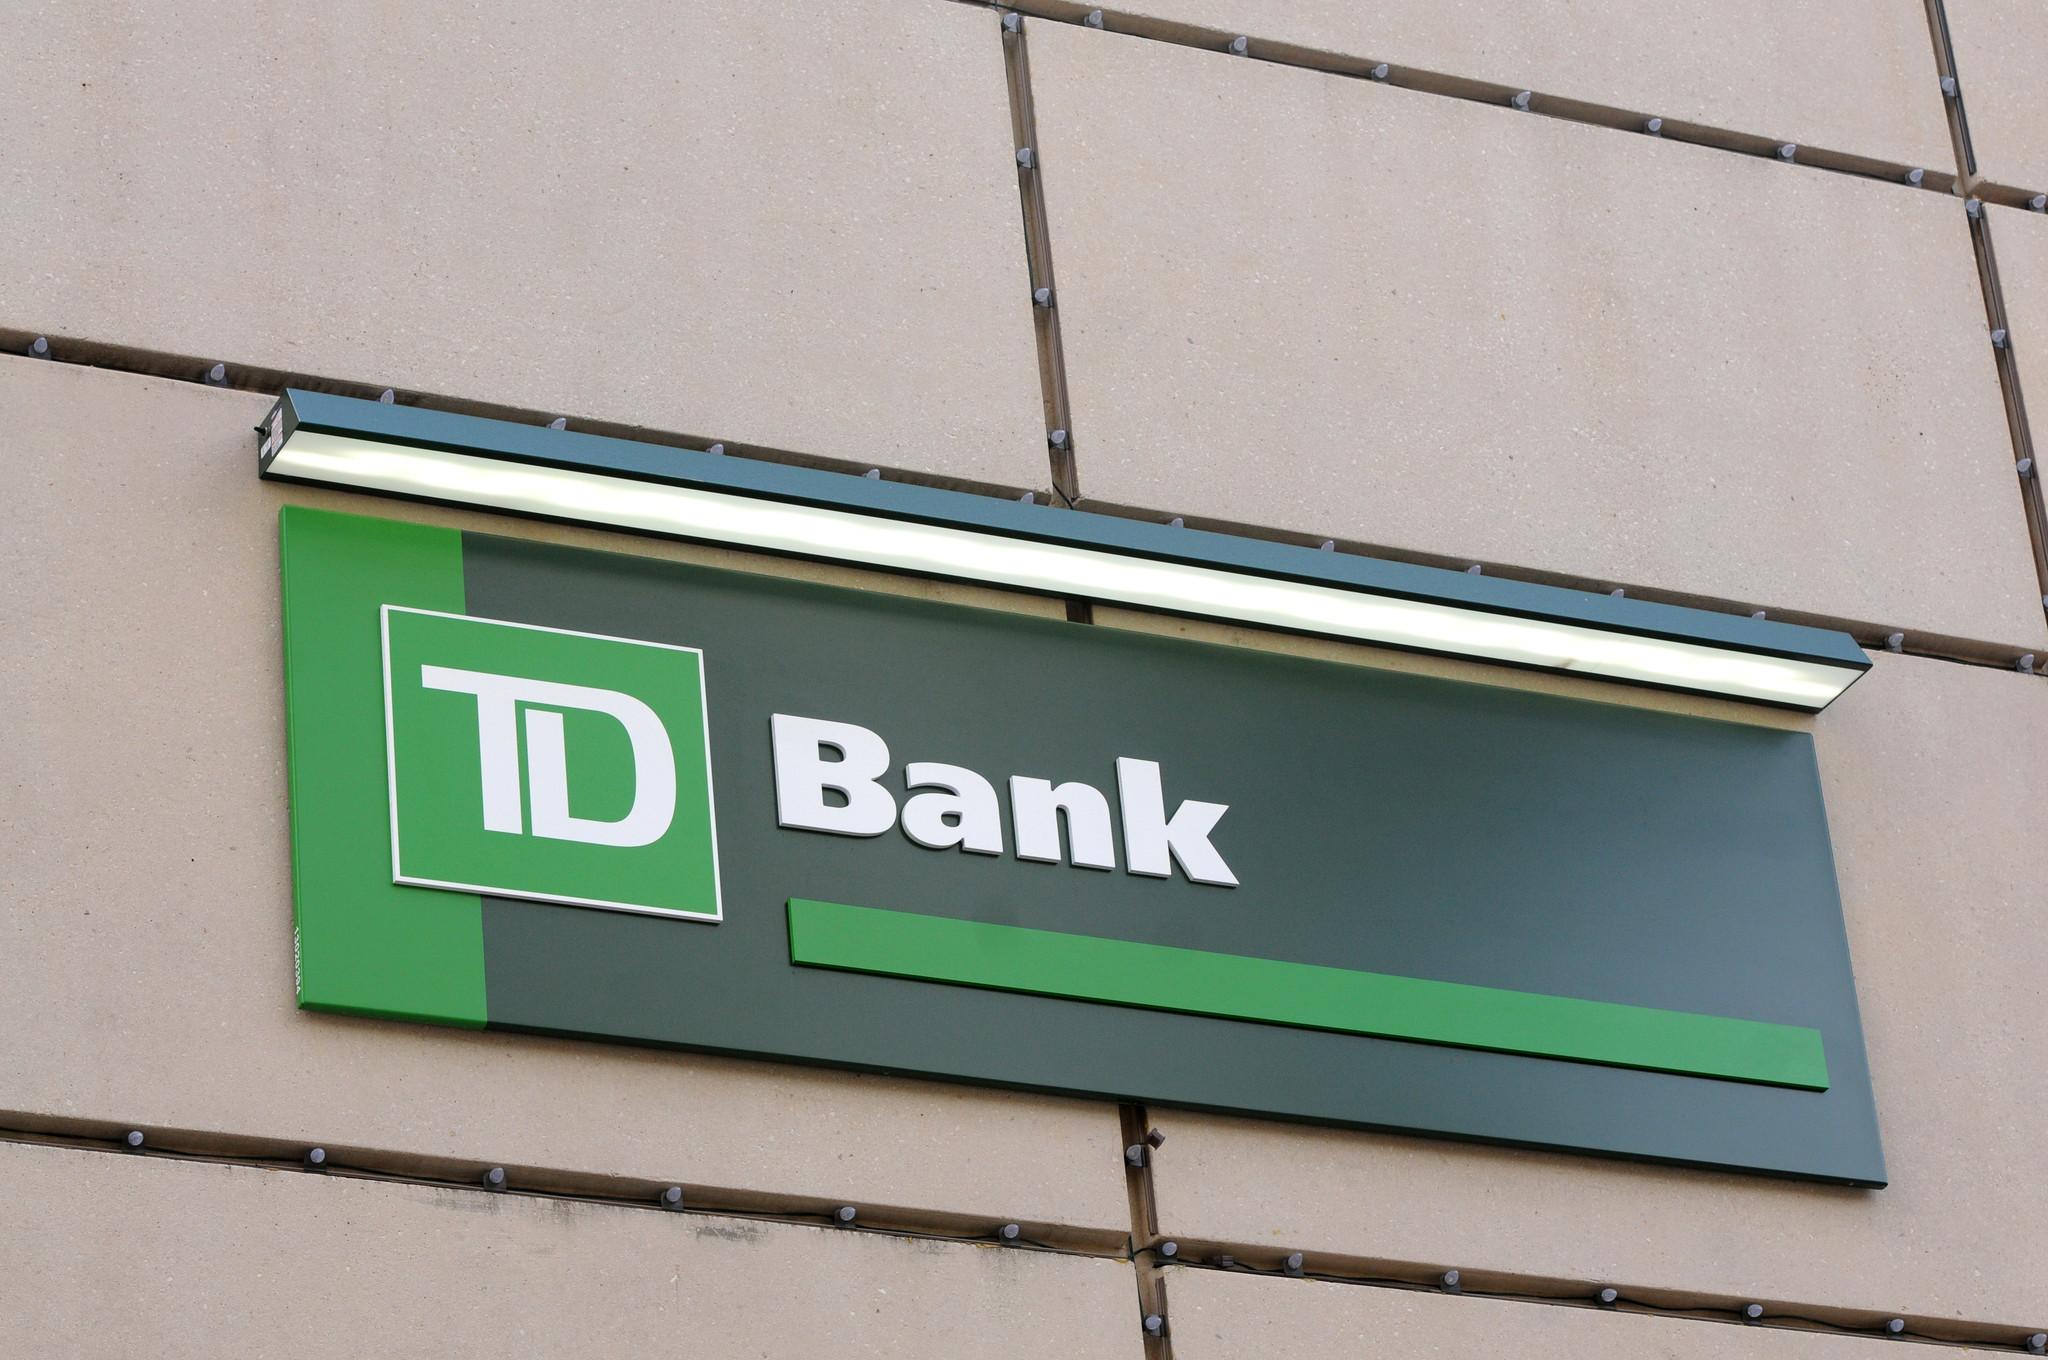 td bank business banking